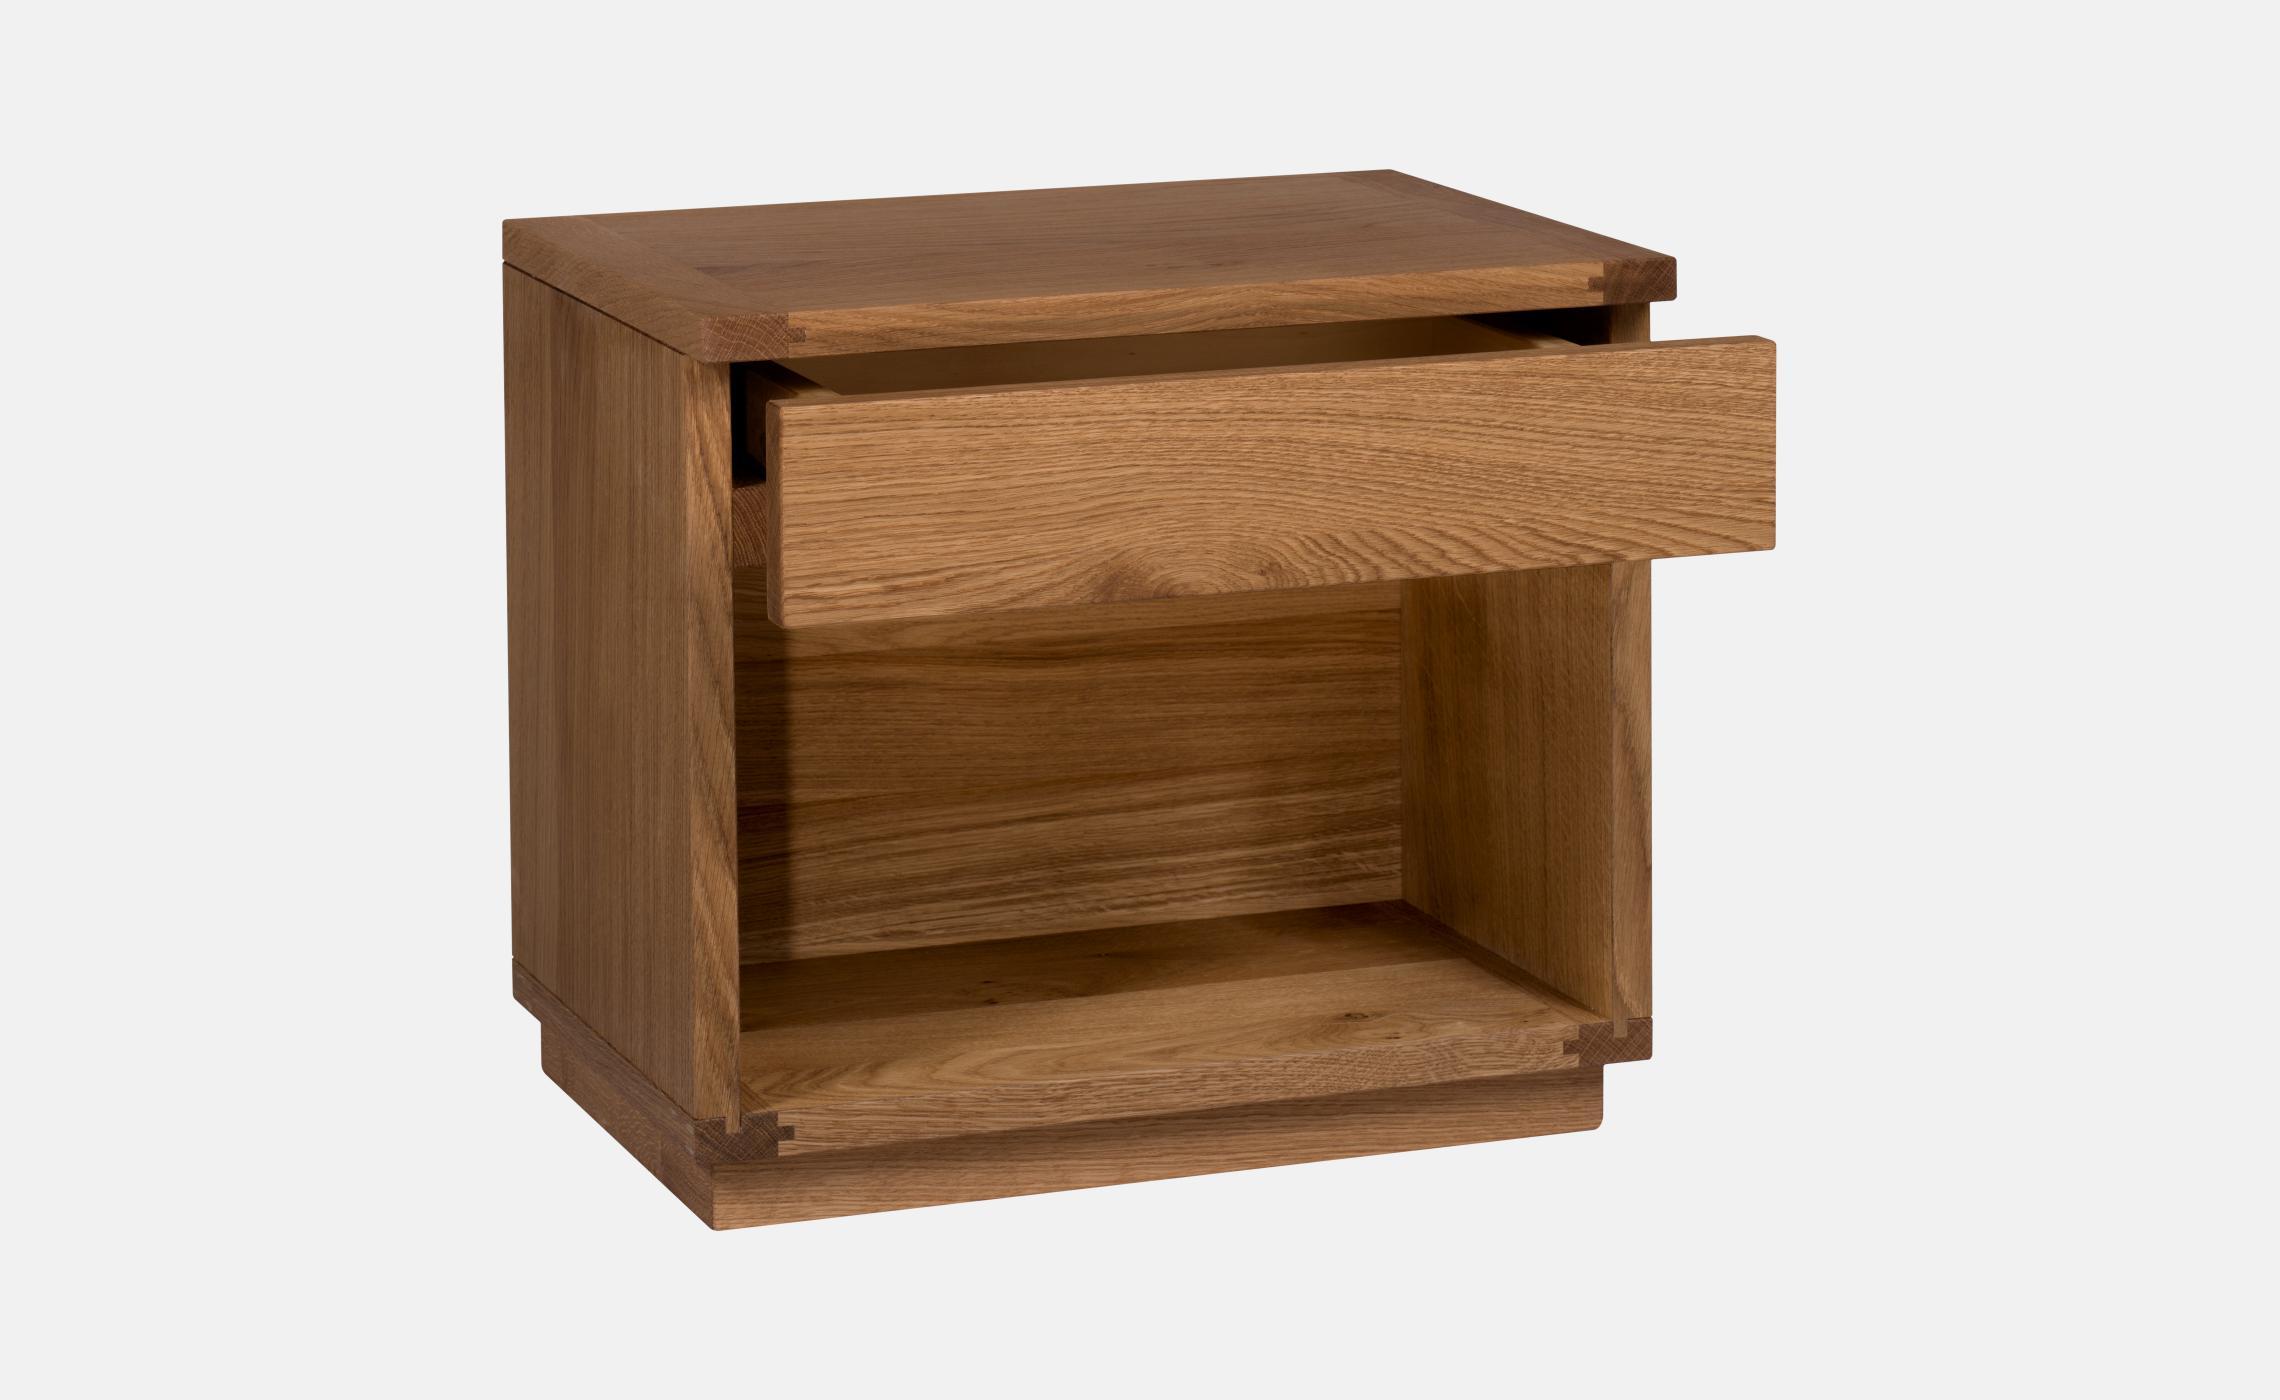 Table de chevet en ch ne avec tiroir zen delorme meubles - Table de chevet zen ...